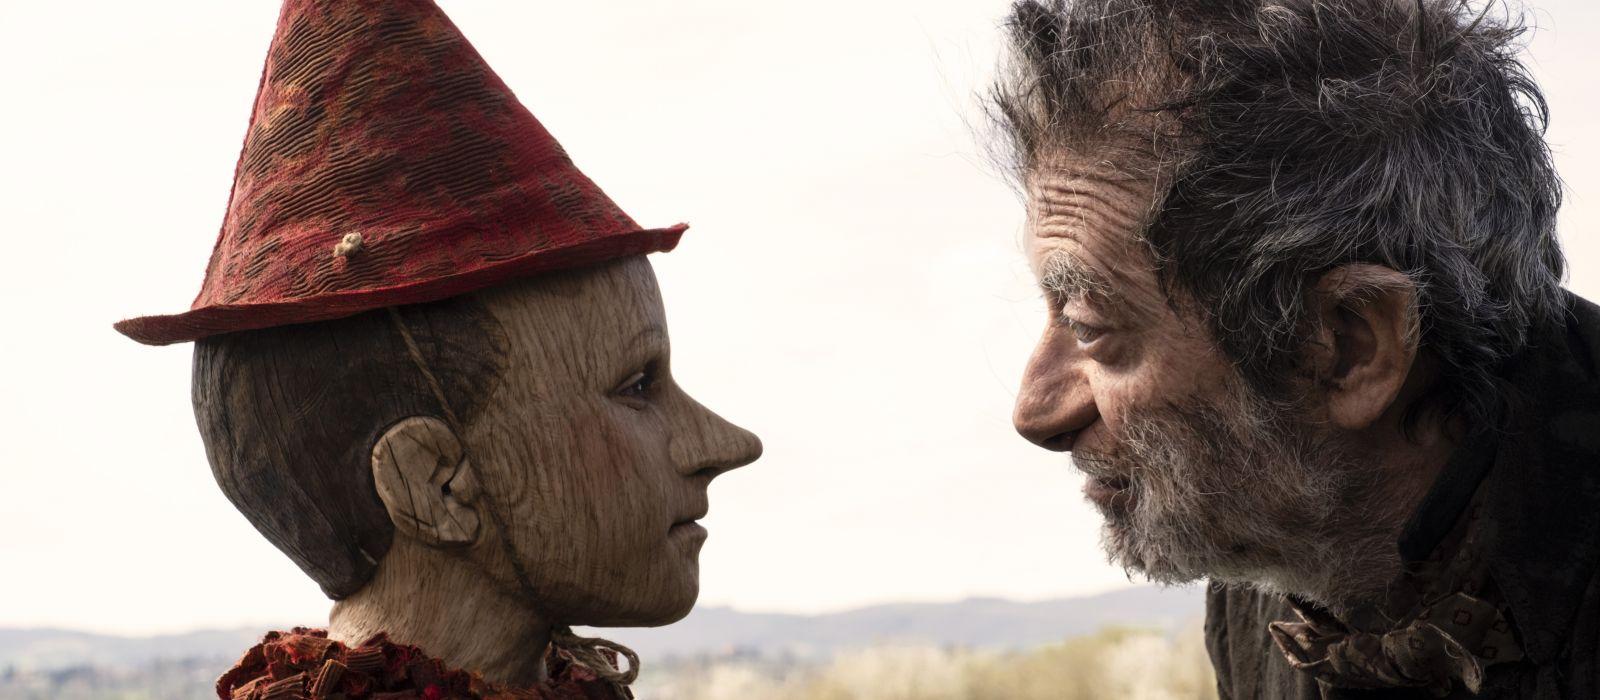 Pinocho (Italia), dirigida por Matteo Garrone. BCN Film Fest 2020